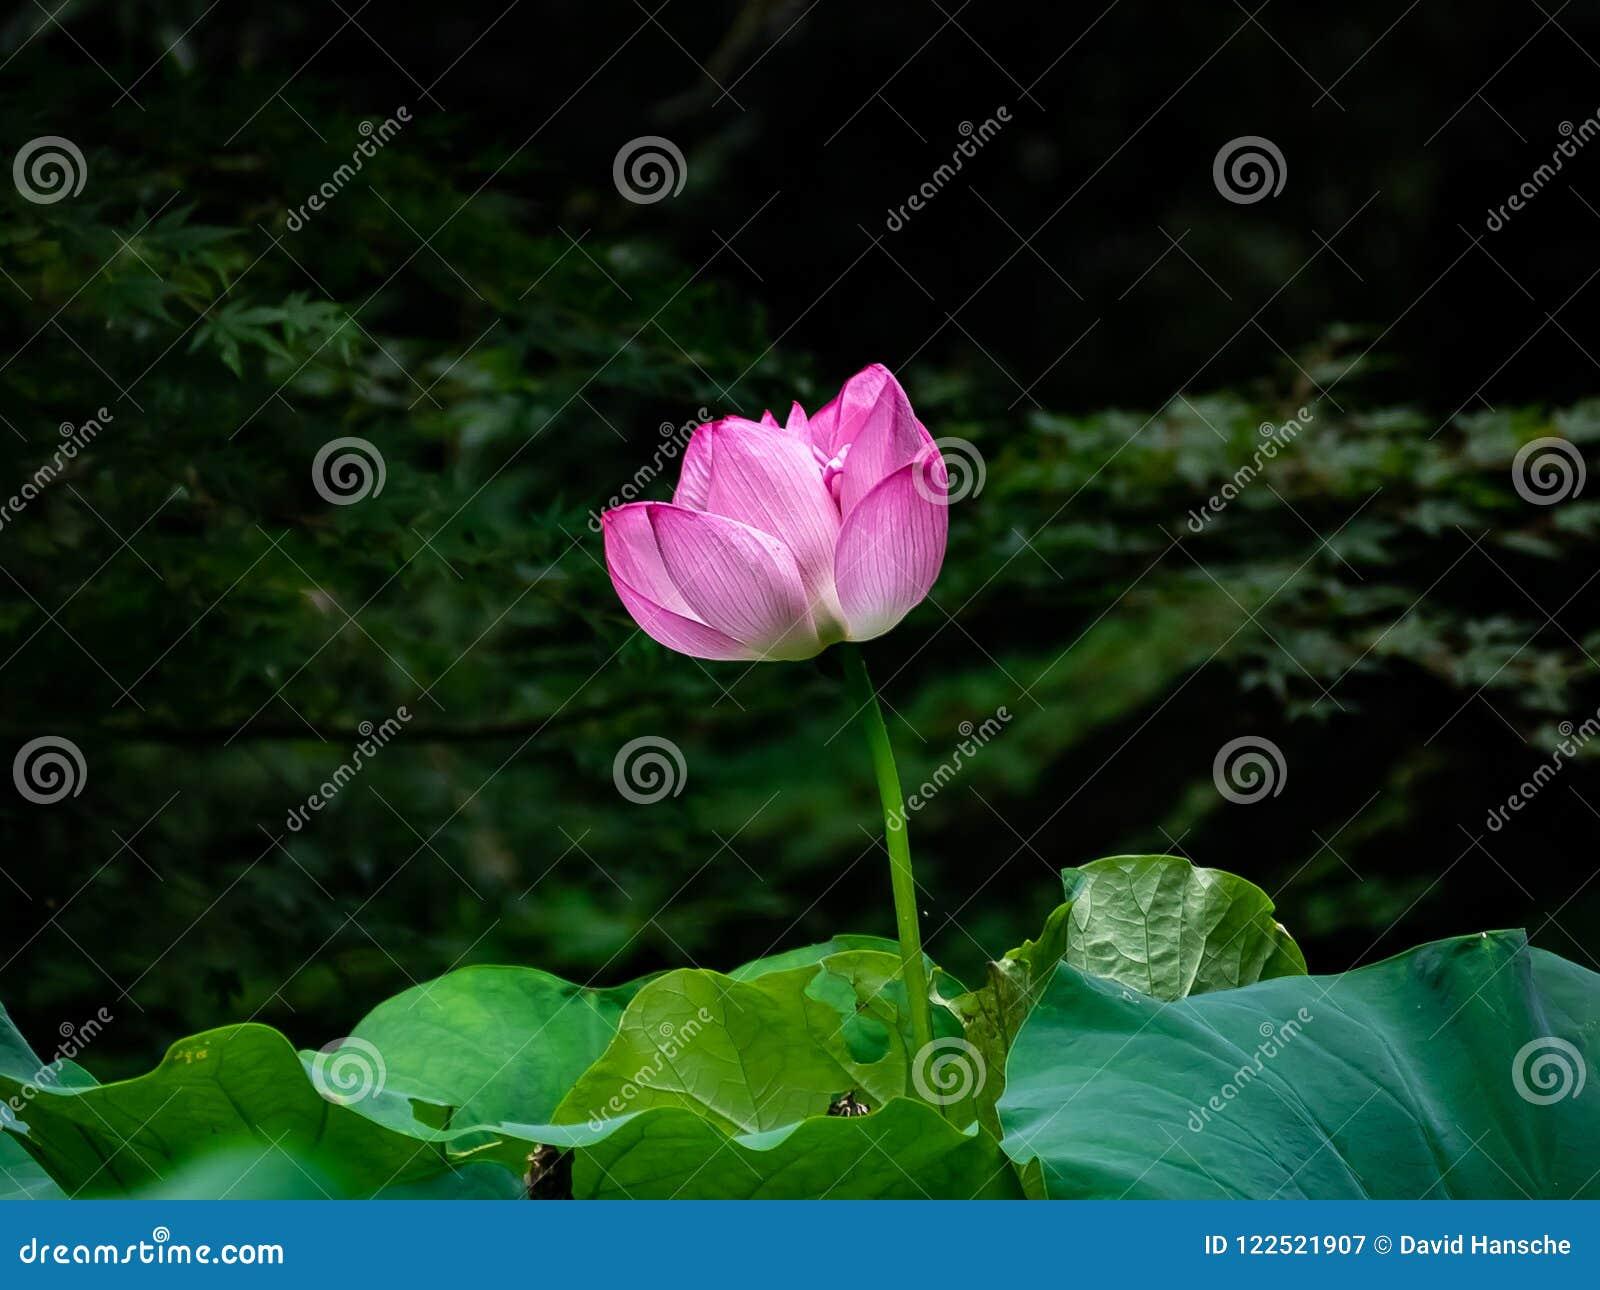 Large Pink Lotus Flower Opening In A Japanese Wetland Stock Image